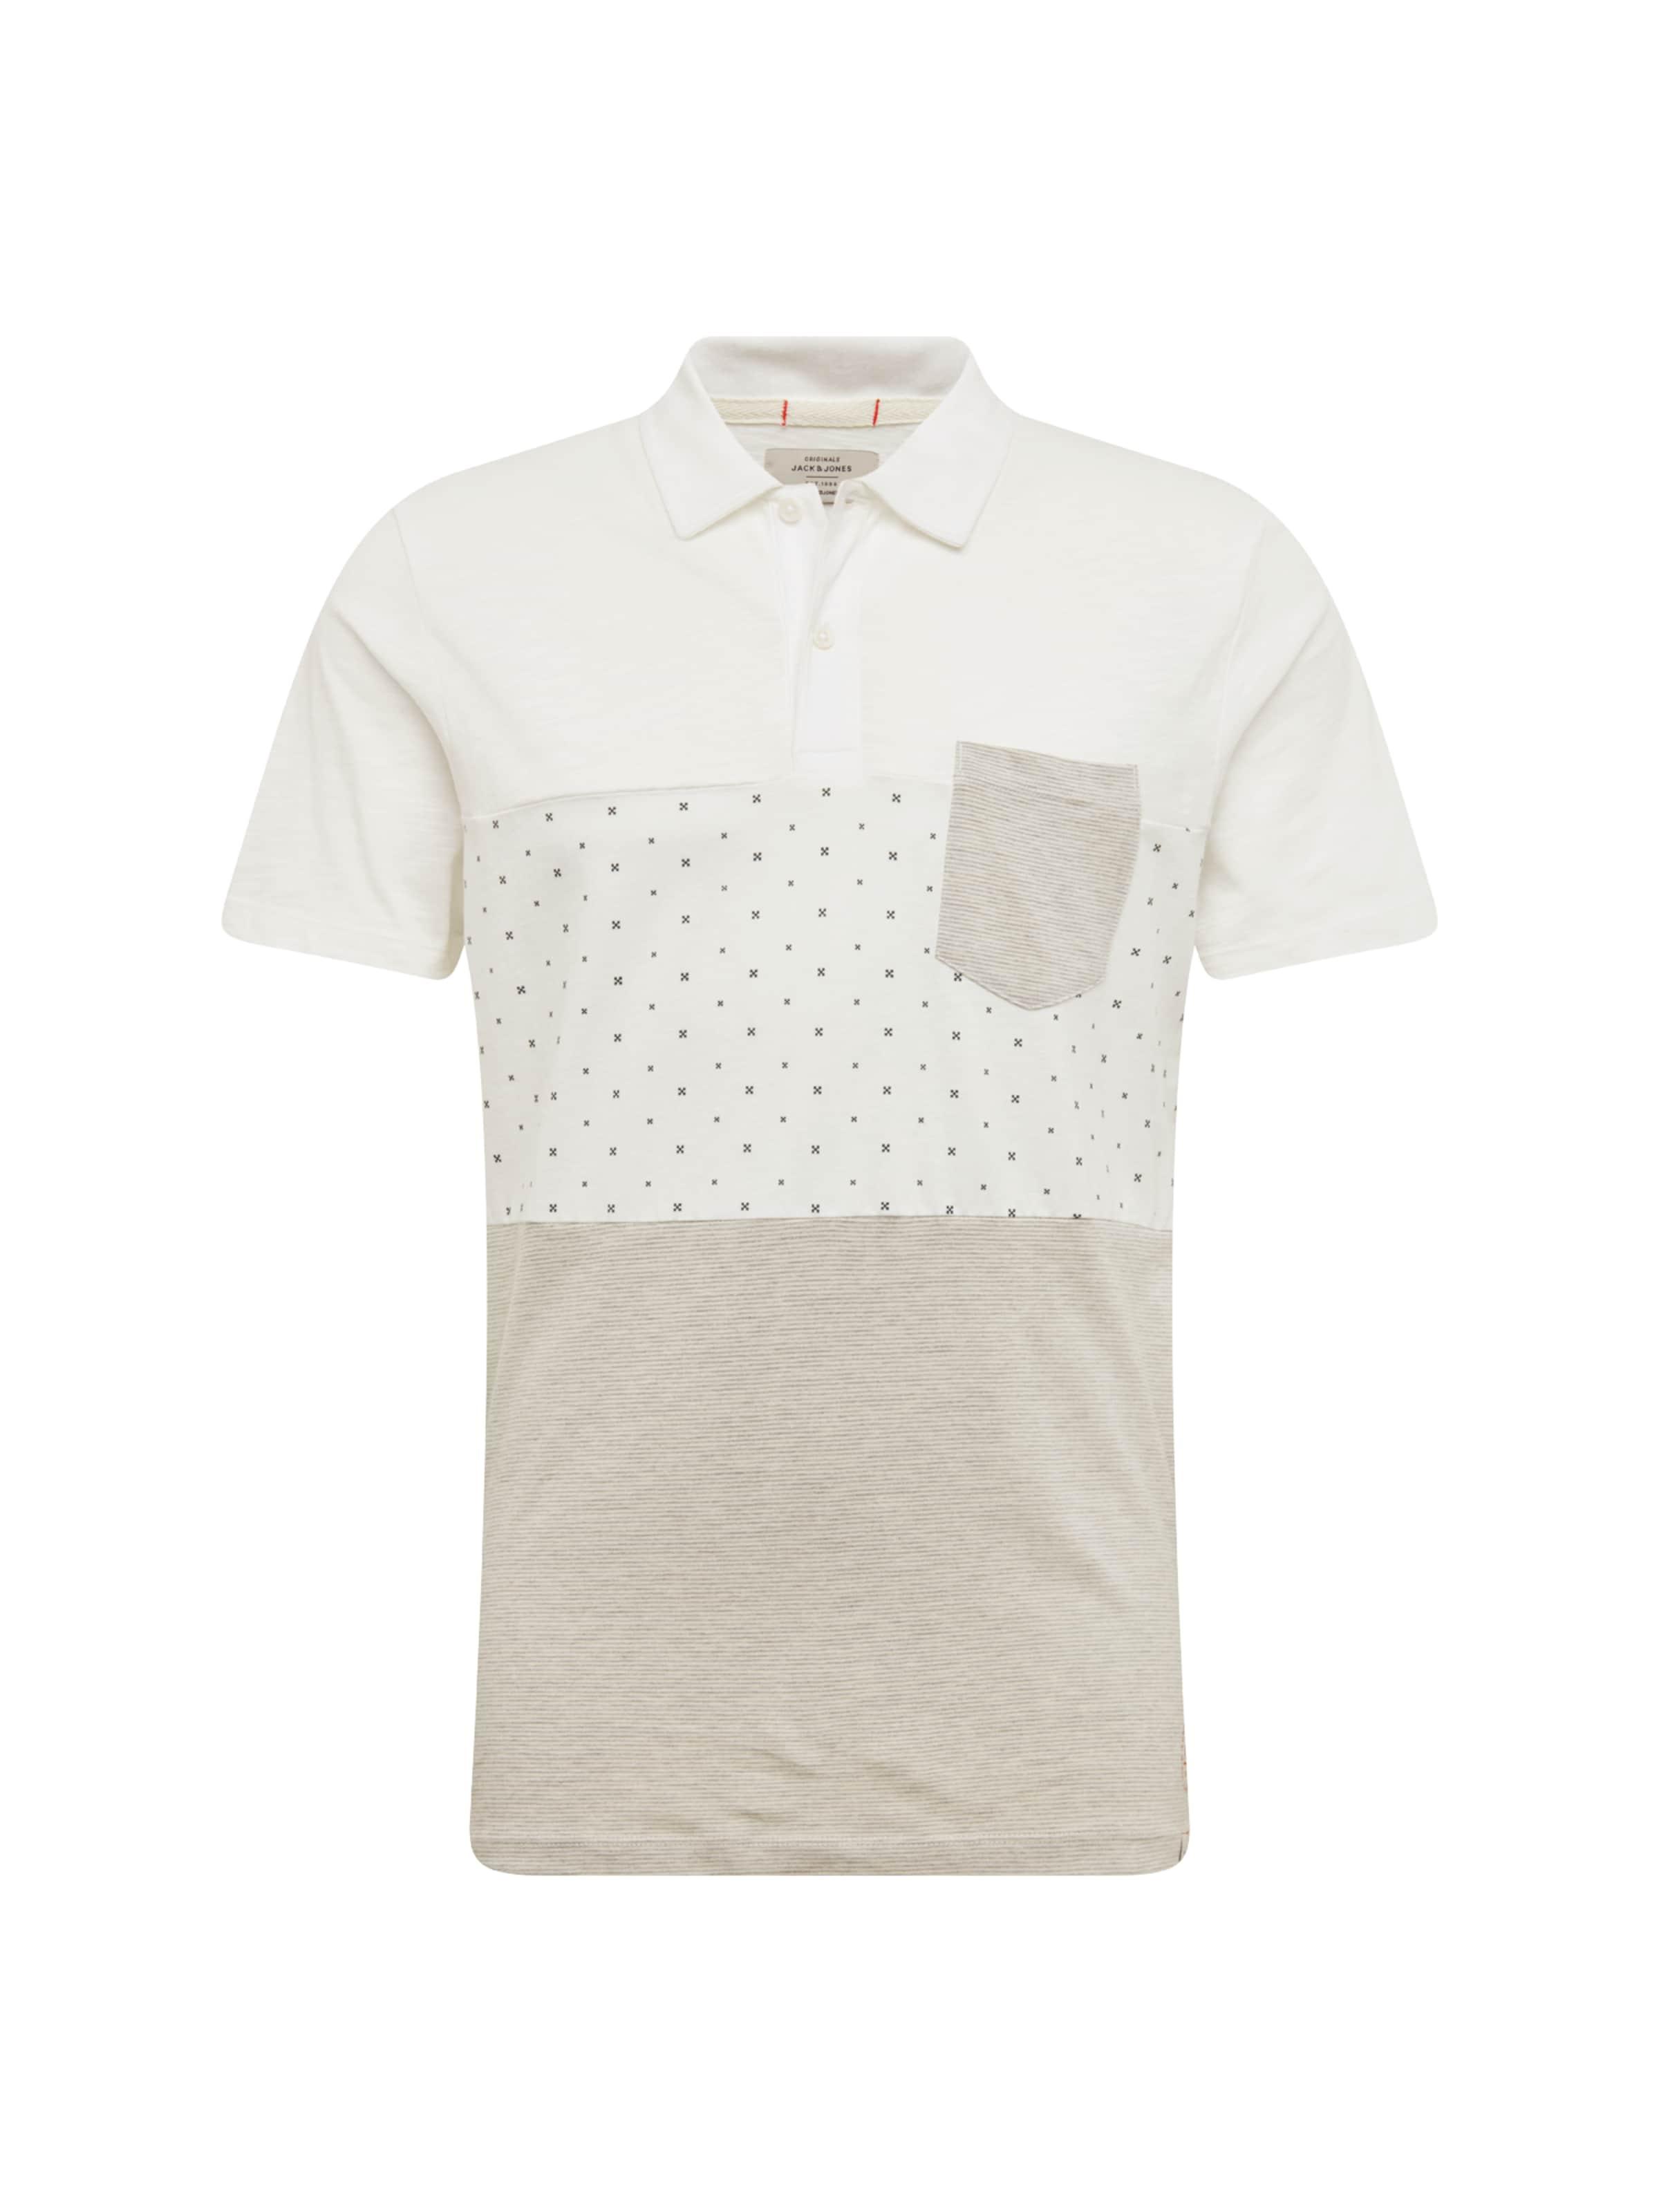 Shirt 'jortobi' HellgrauWeiß In Jones Jackamp; kXuOPZi